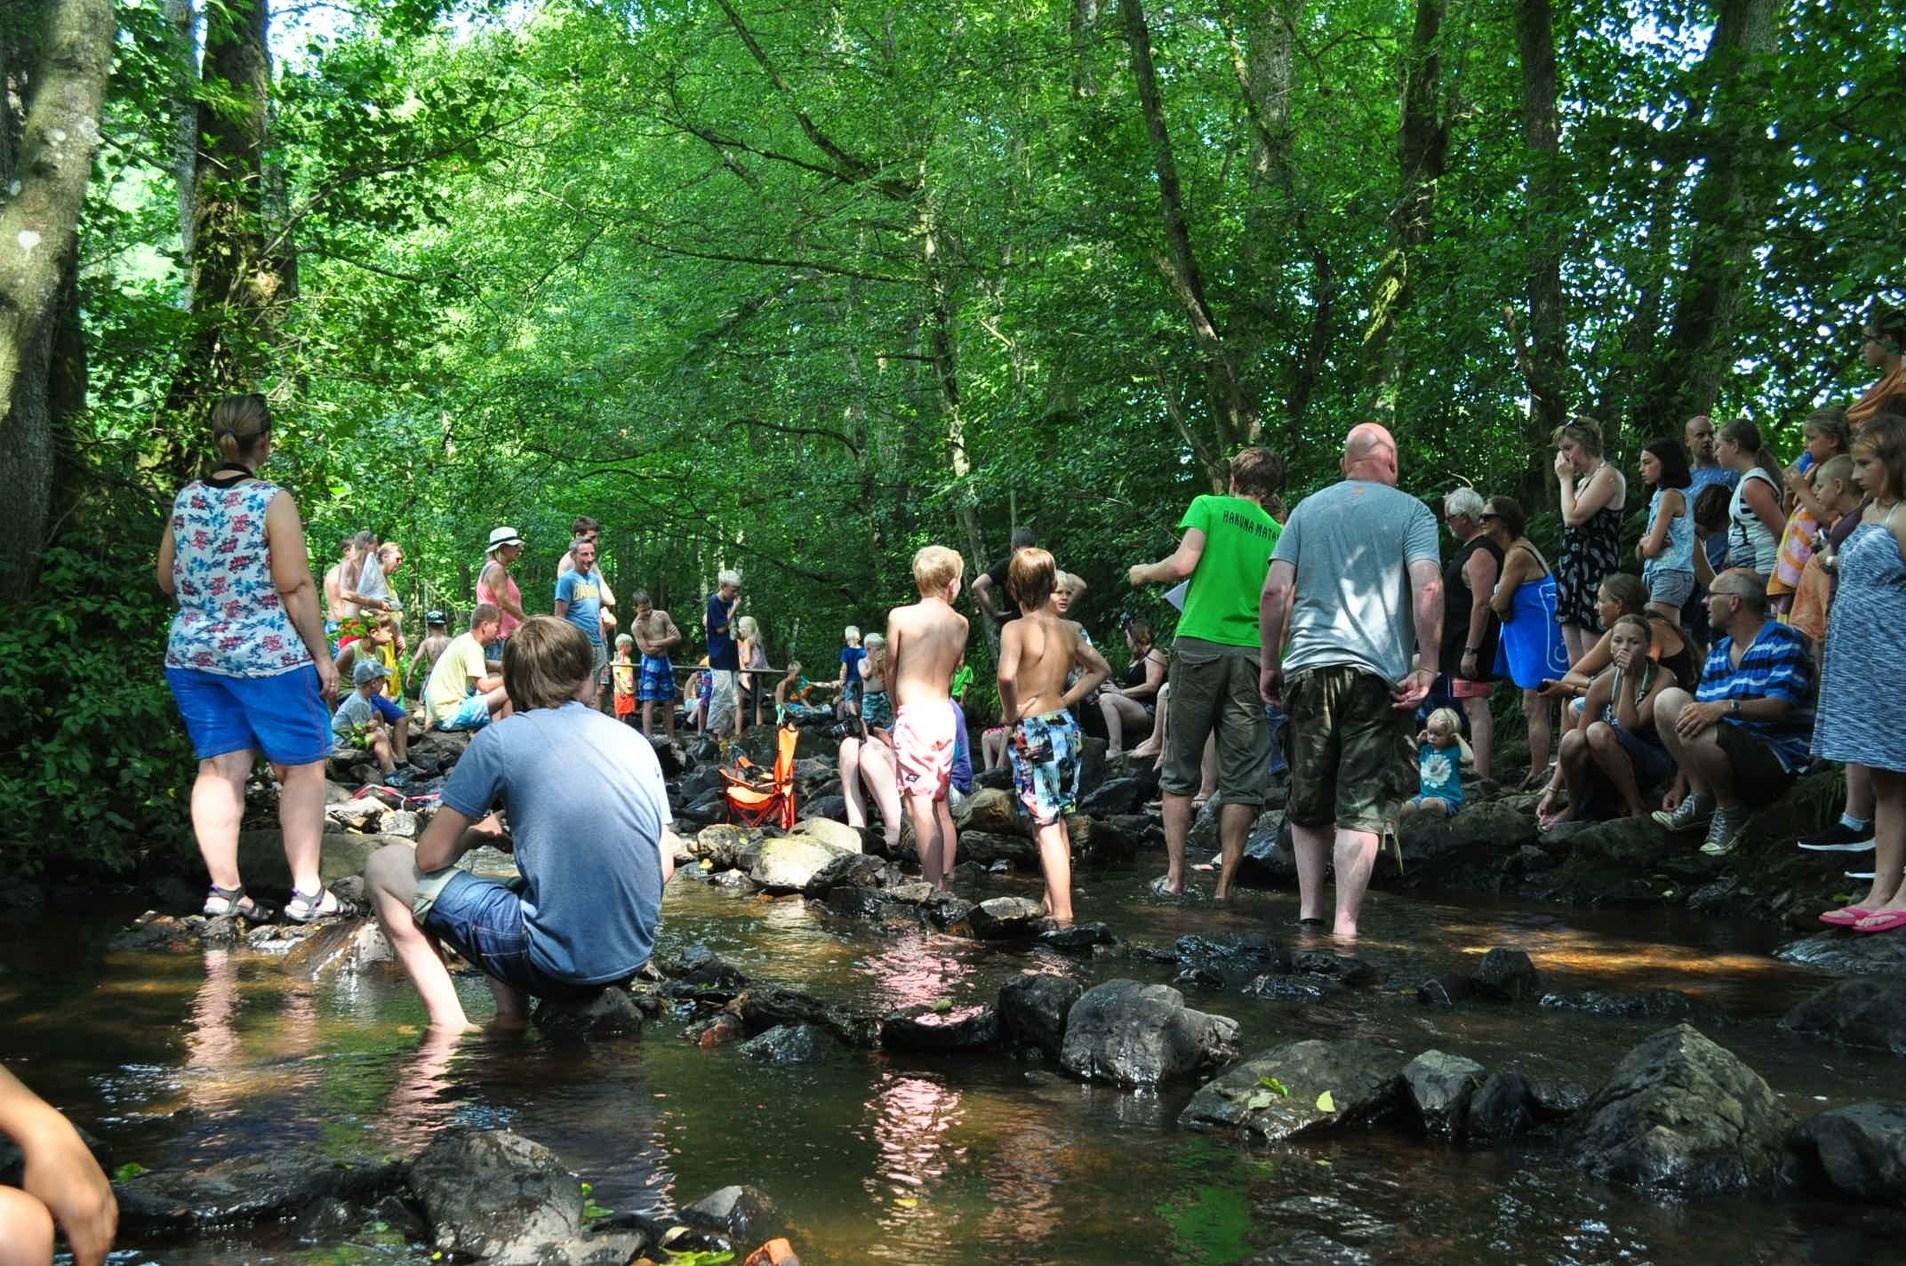 Belgie-Stavelot-Camping%20lEau%20Rouge-ExtraLarge Campings België|Pagina 2 van 2